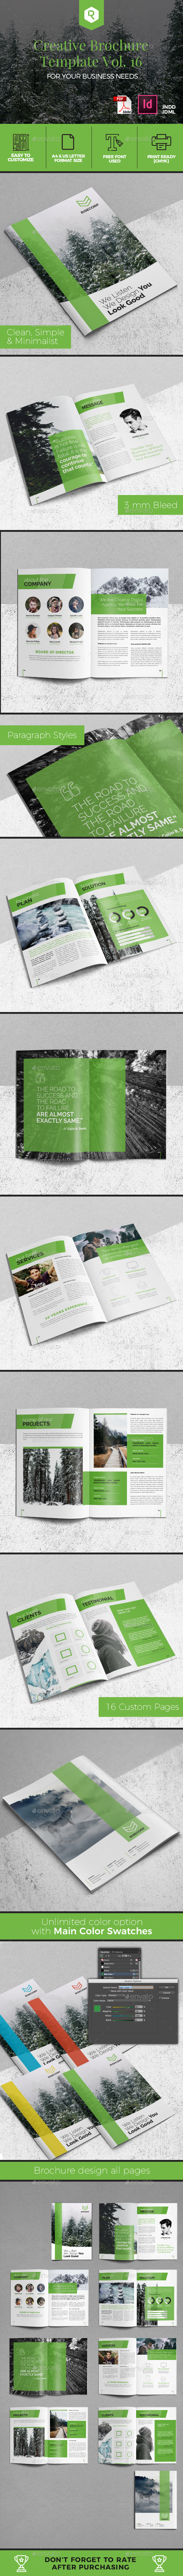 Creative Brochure Template Vol. 16 - Corporate Brochures